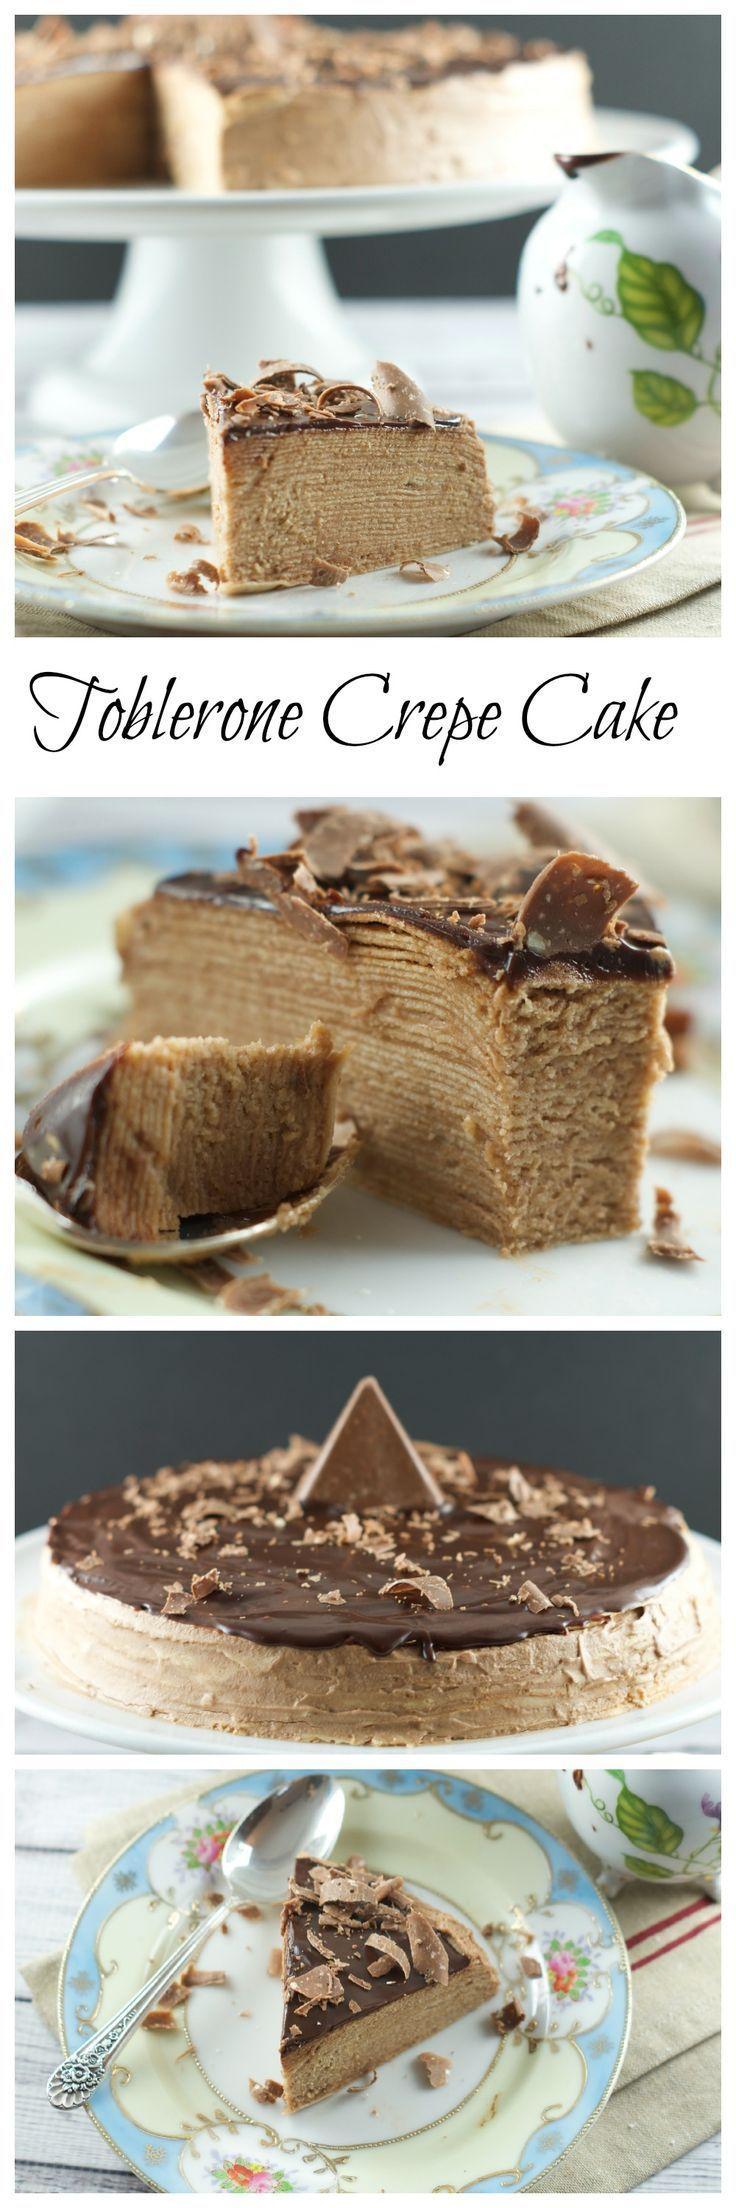 Best 20+ Toblerone chocolate ideas on Pinterest | Toblerone ...